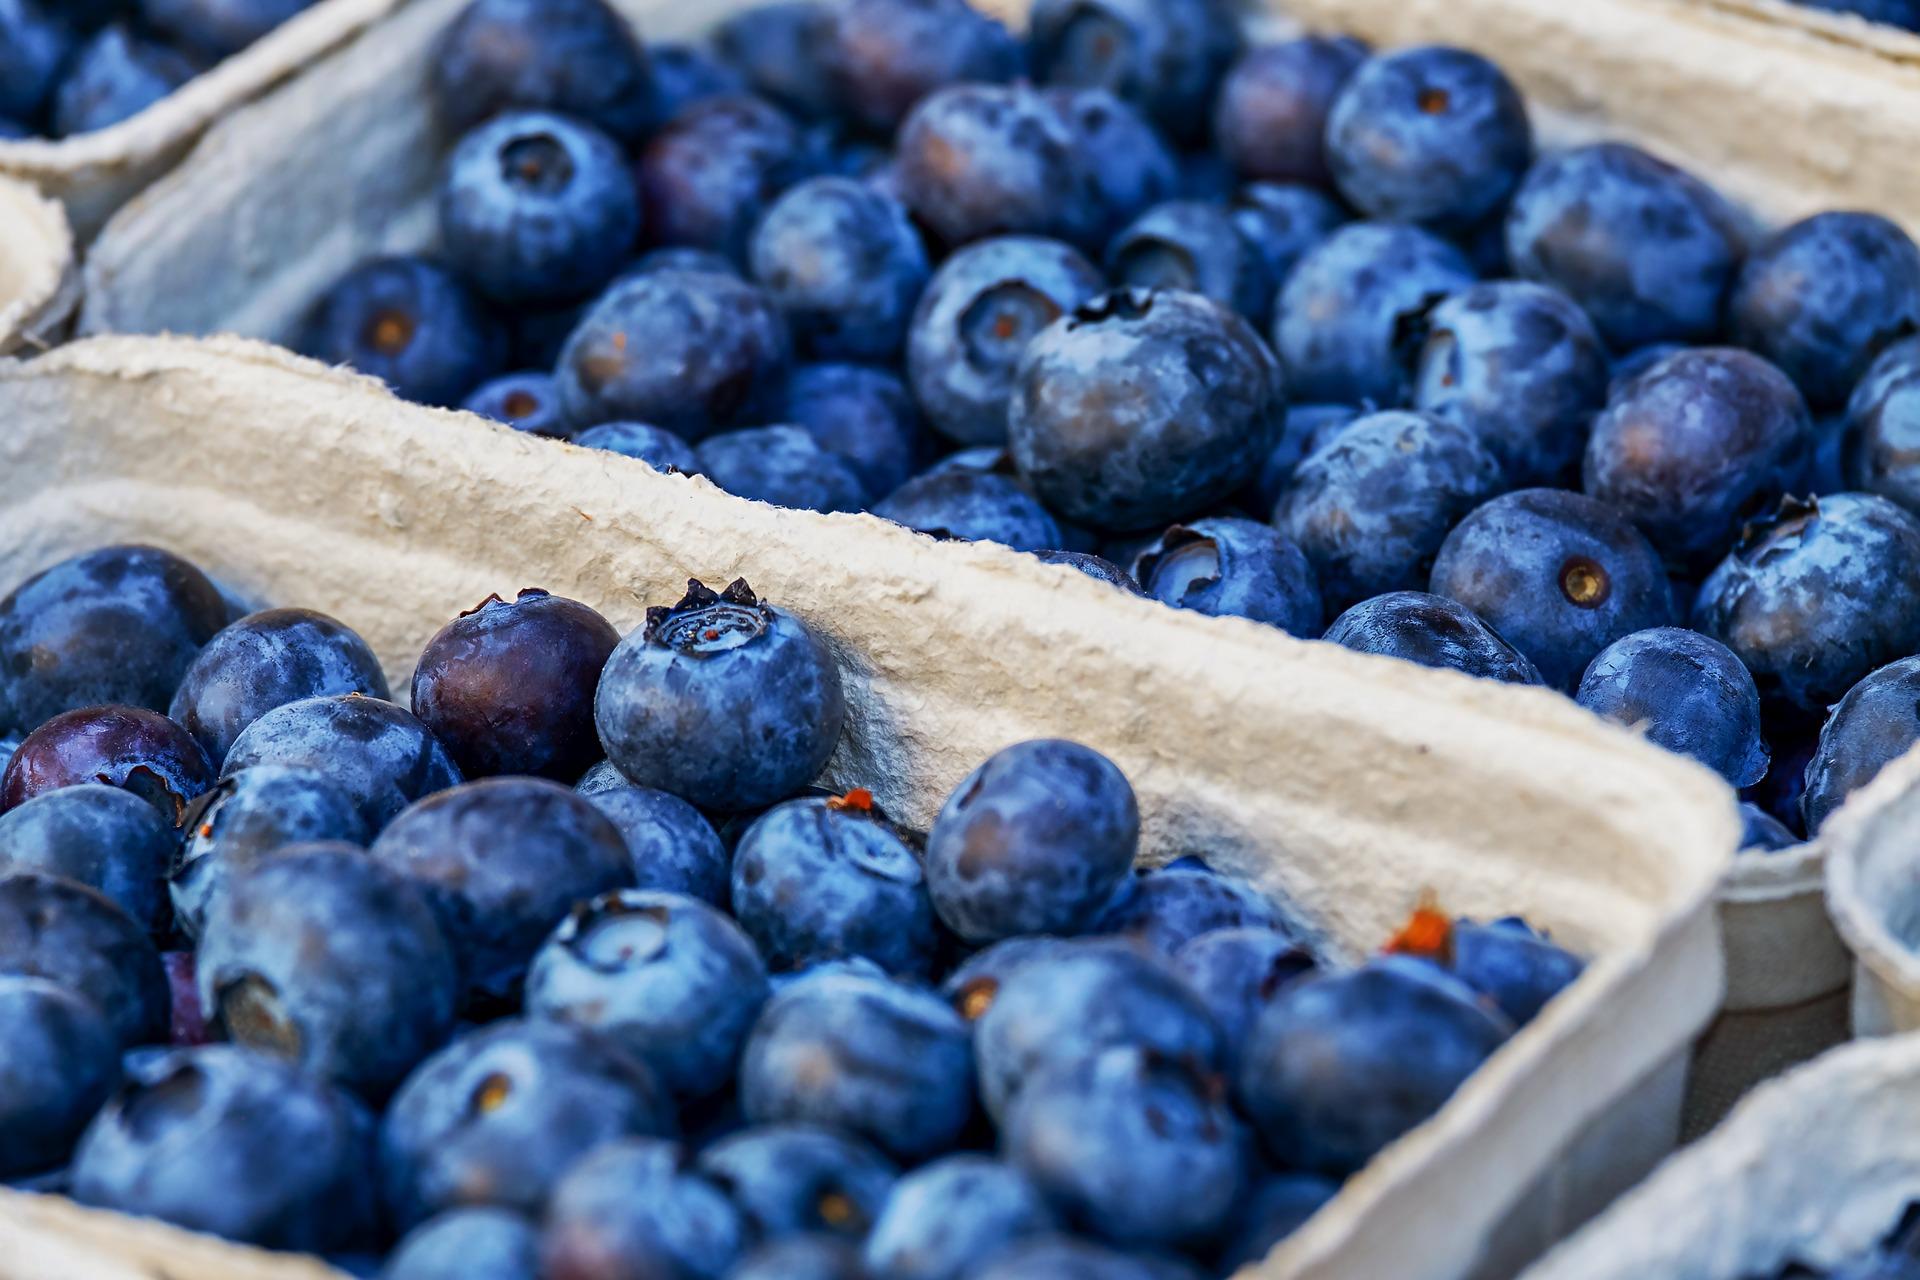 blueberries-3474854_1920.jpg